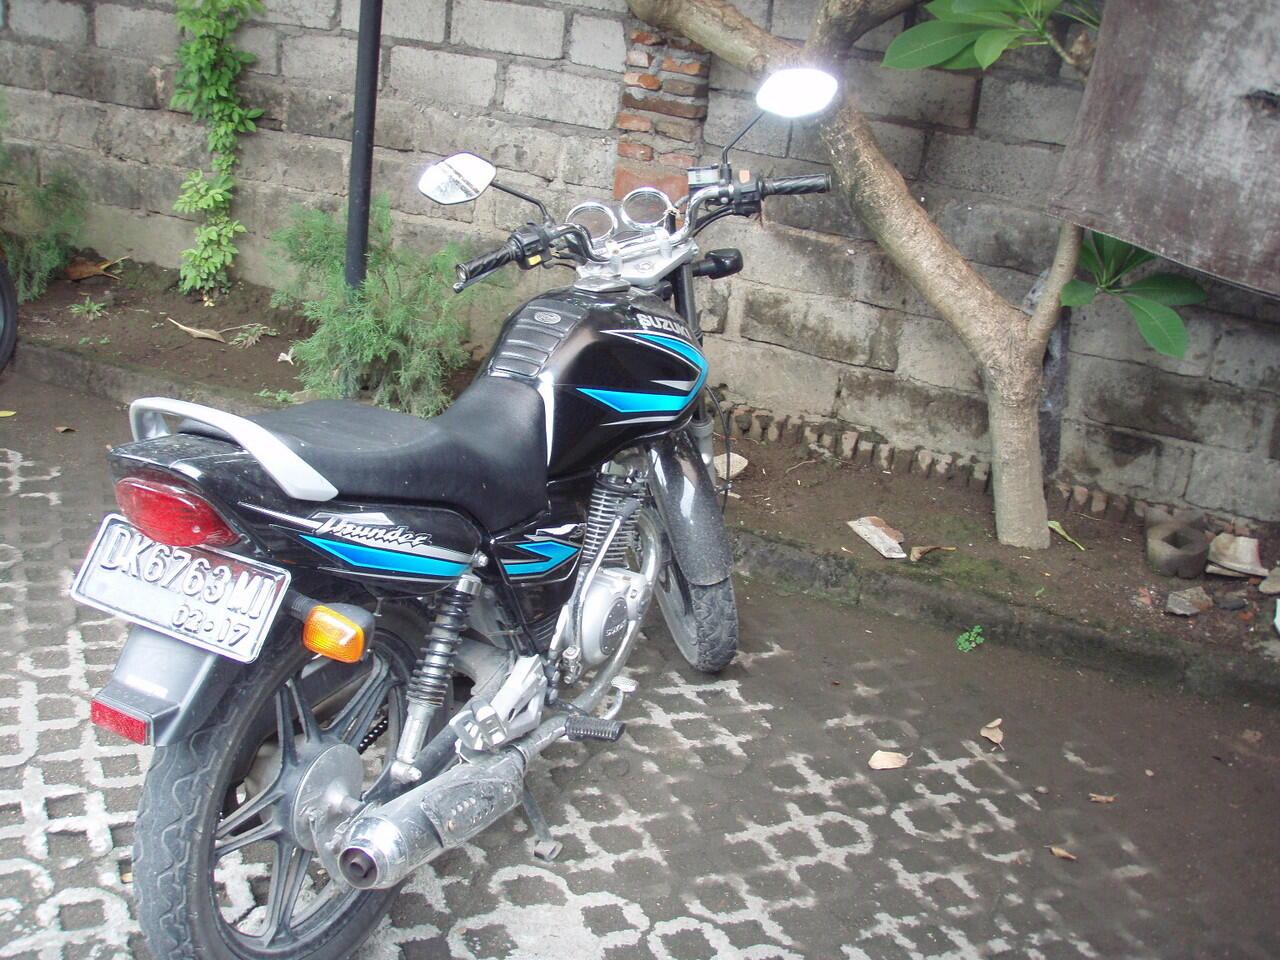 Suzuki Thunder 125cc tahun 2007, 5 jt, STNK baru diperpanjang - Bali